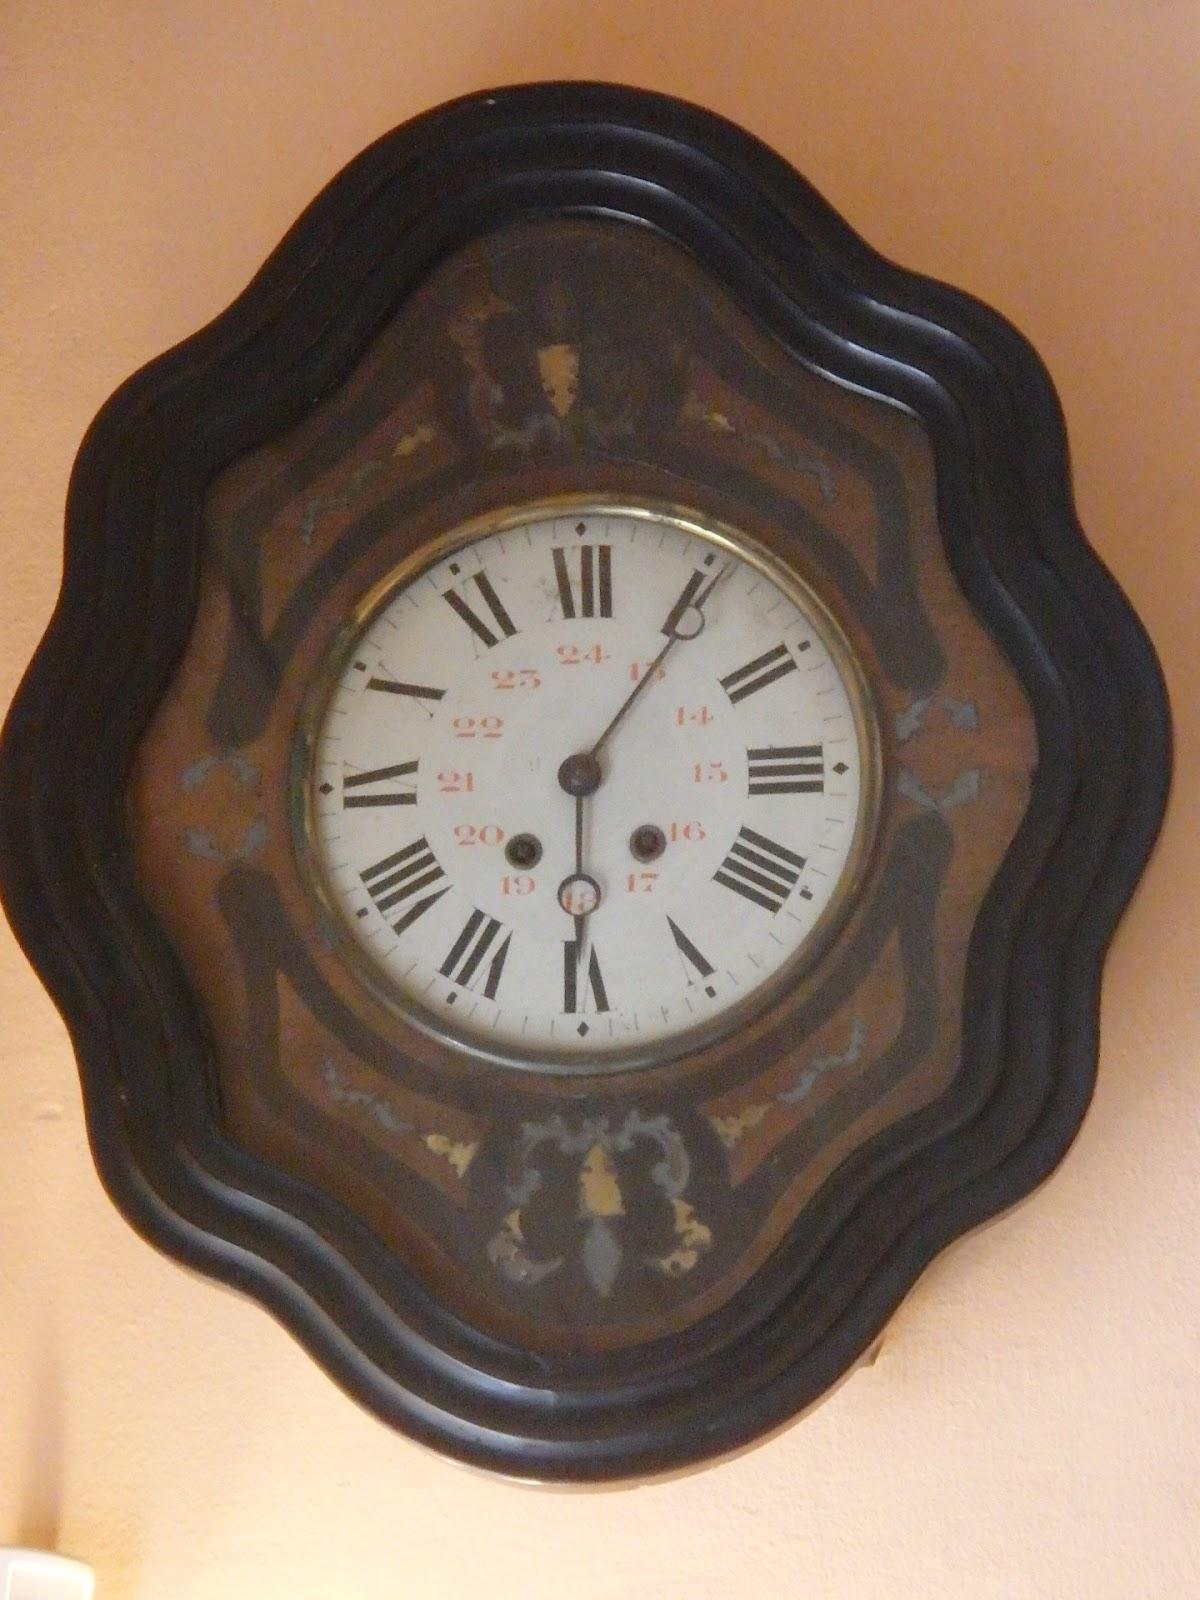 Madridmetropolis detalles de madrid la otra colecci n - Reloj decorativo de pared ...